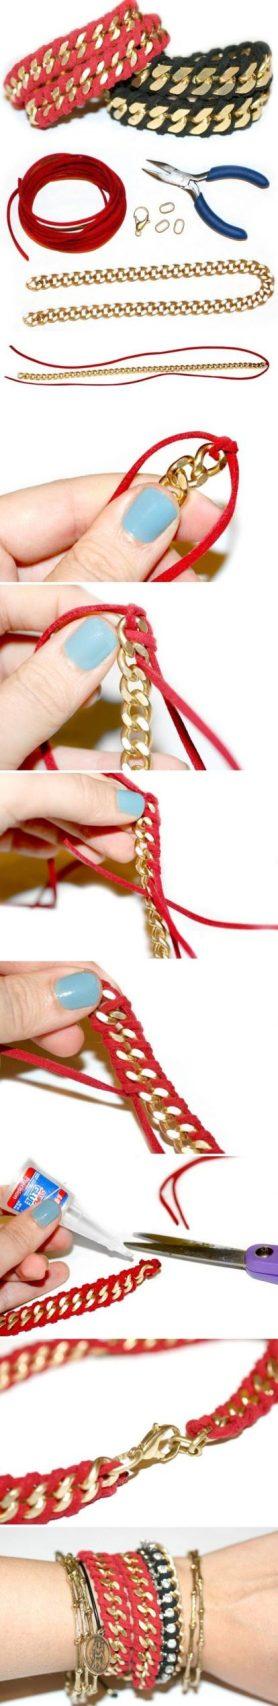 pulseras cadenas bracelets chains jewelry